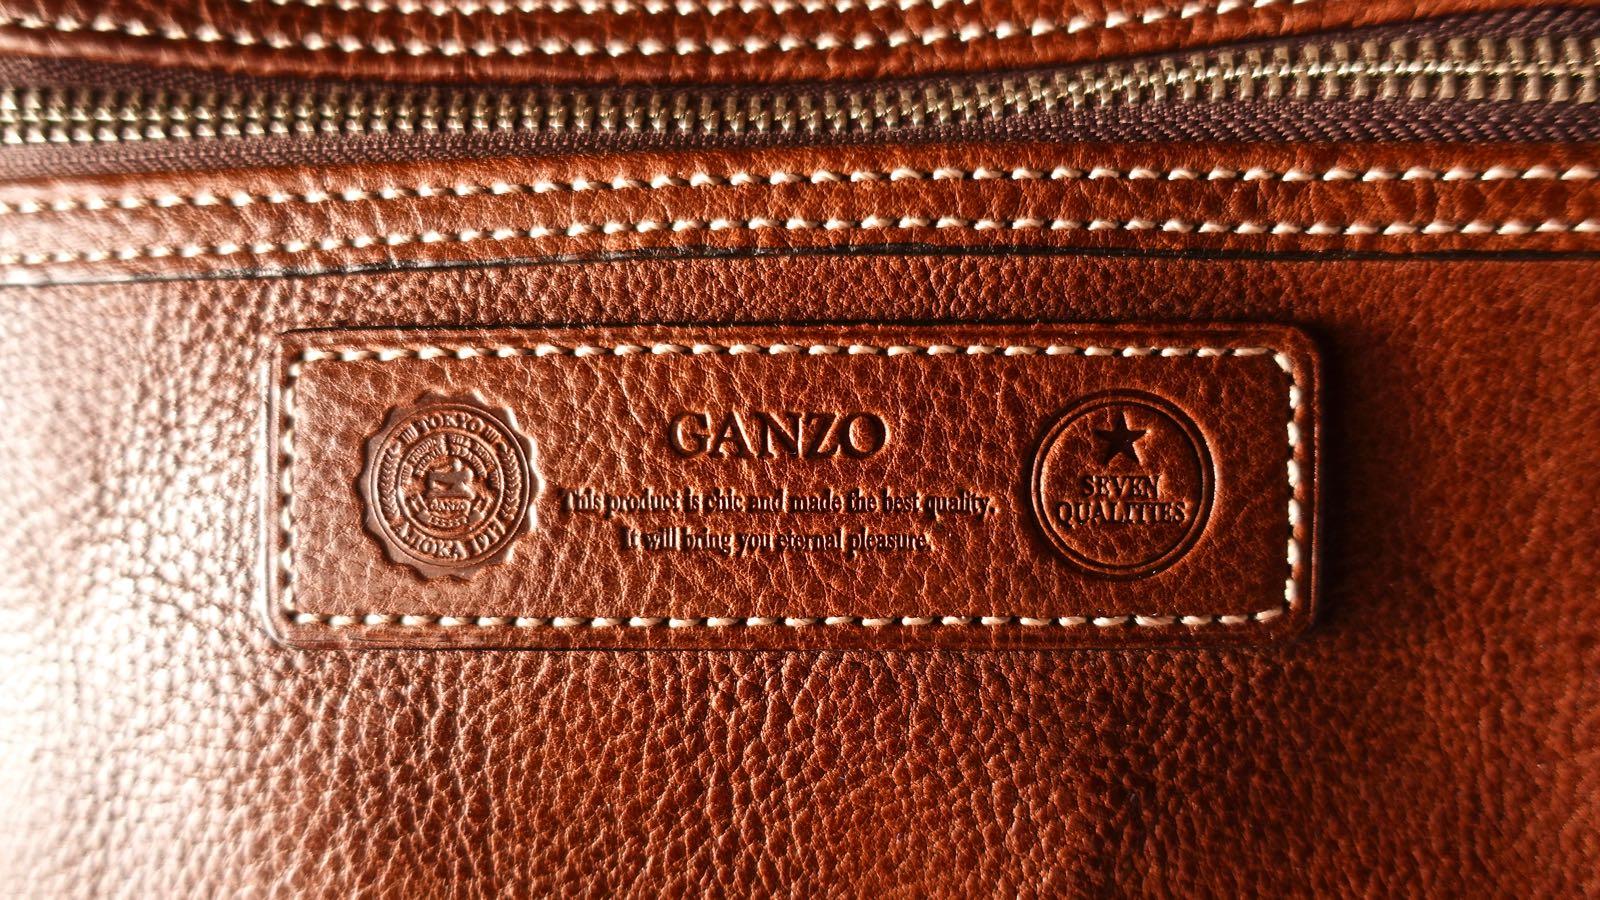 0047 Ganzo Seven Quality Navigator Back 03